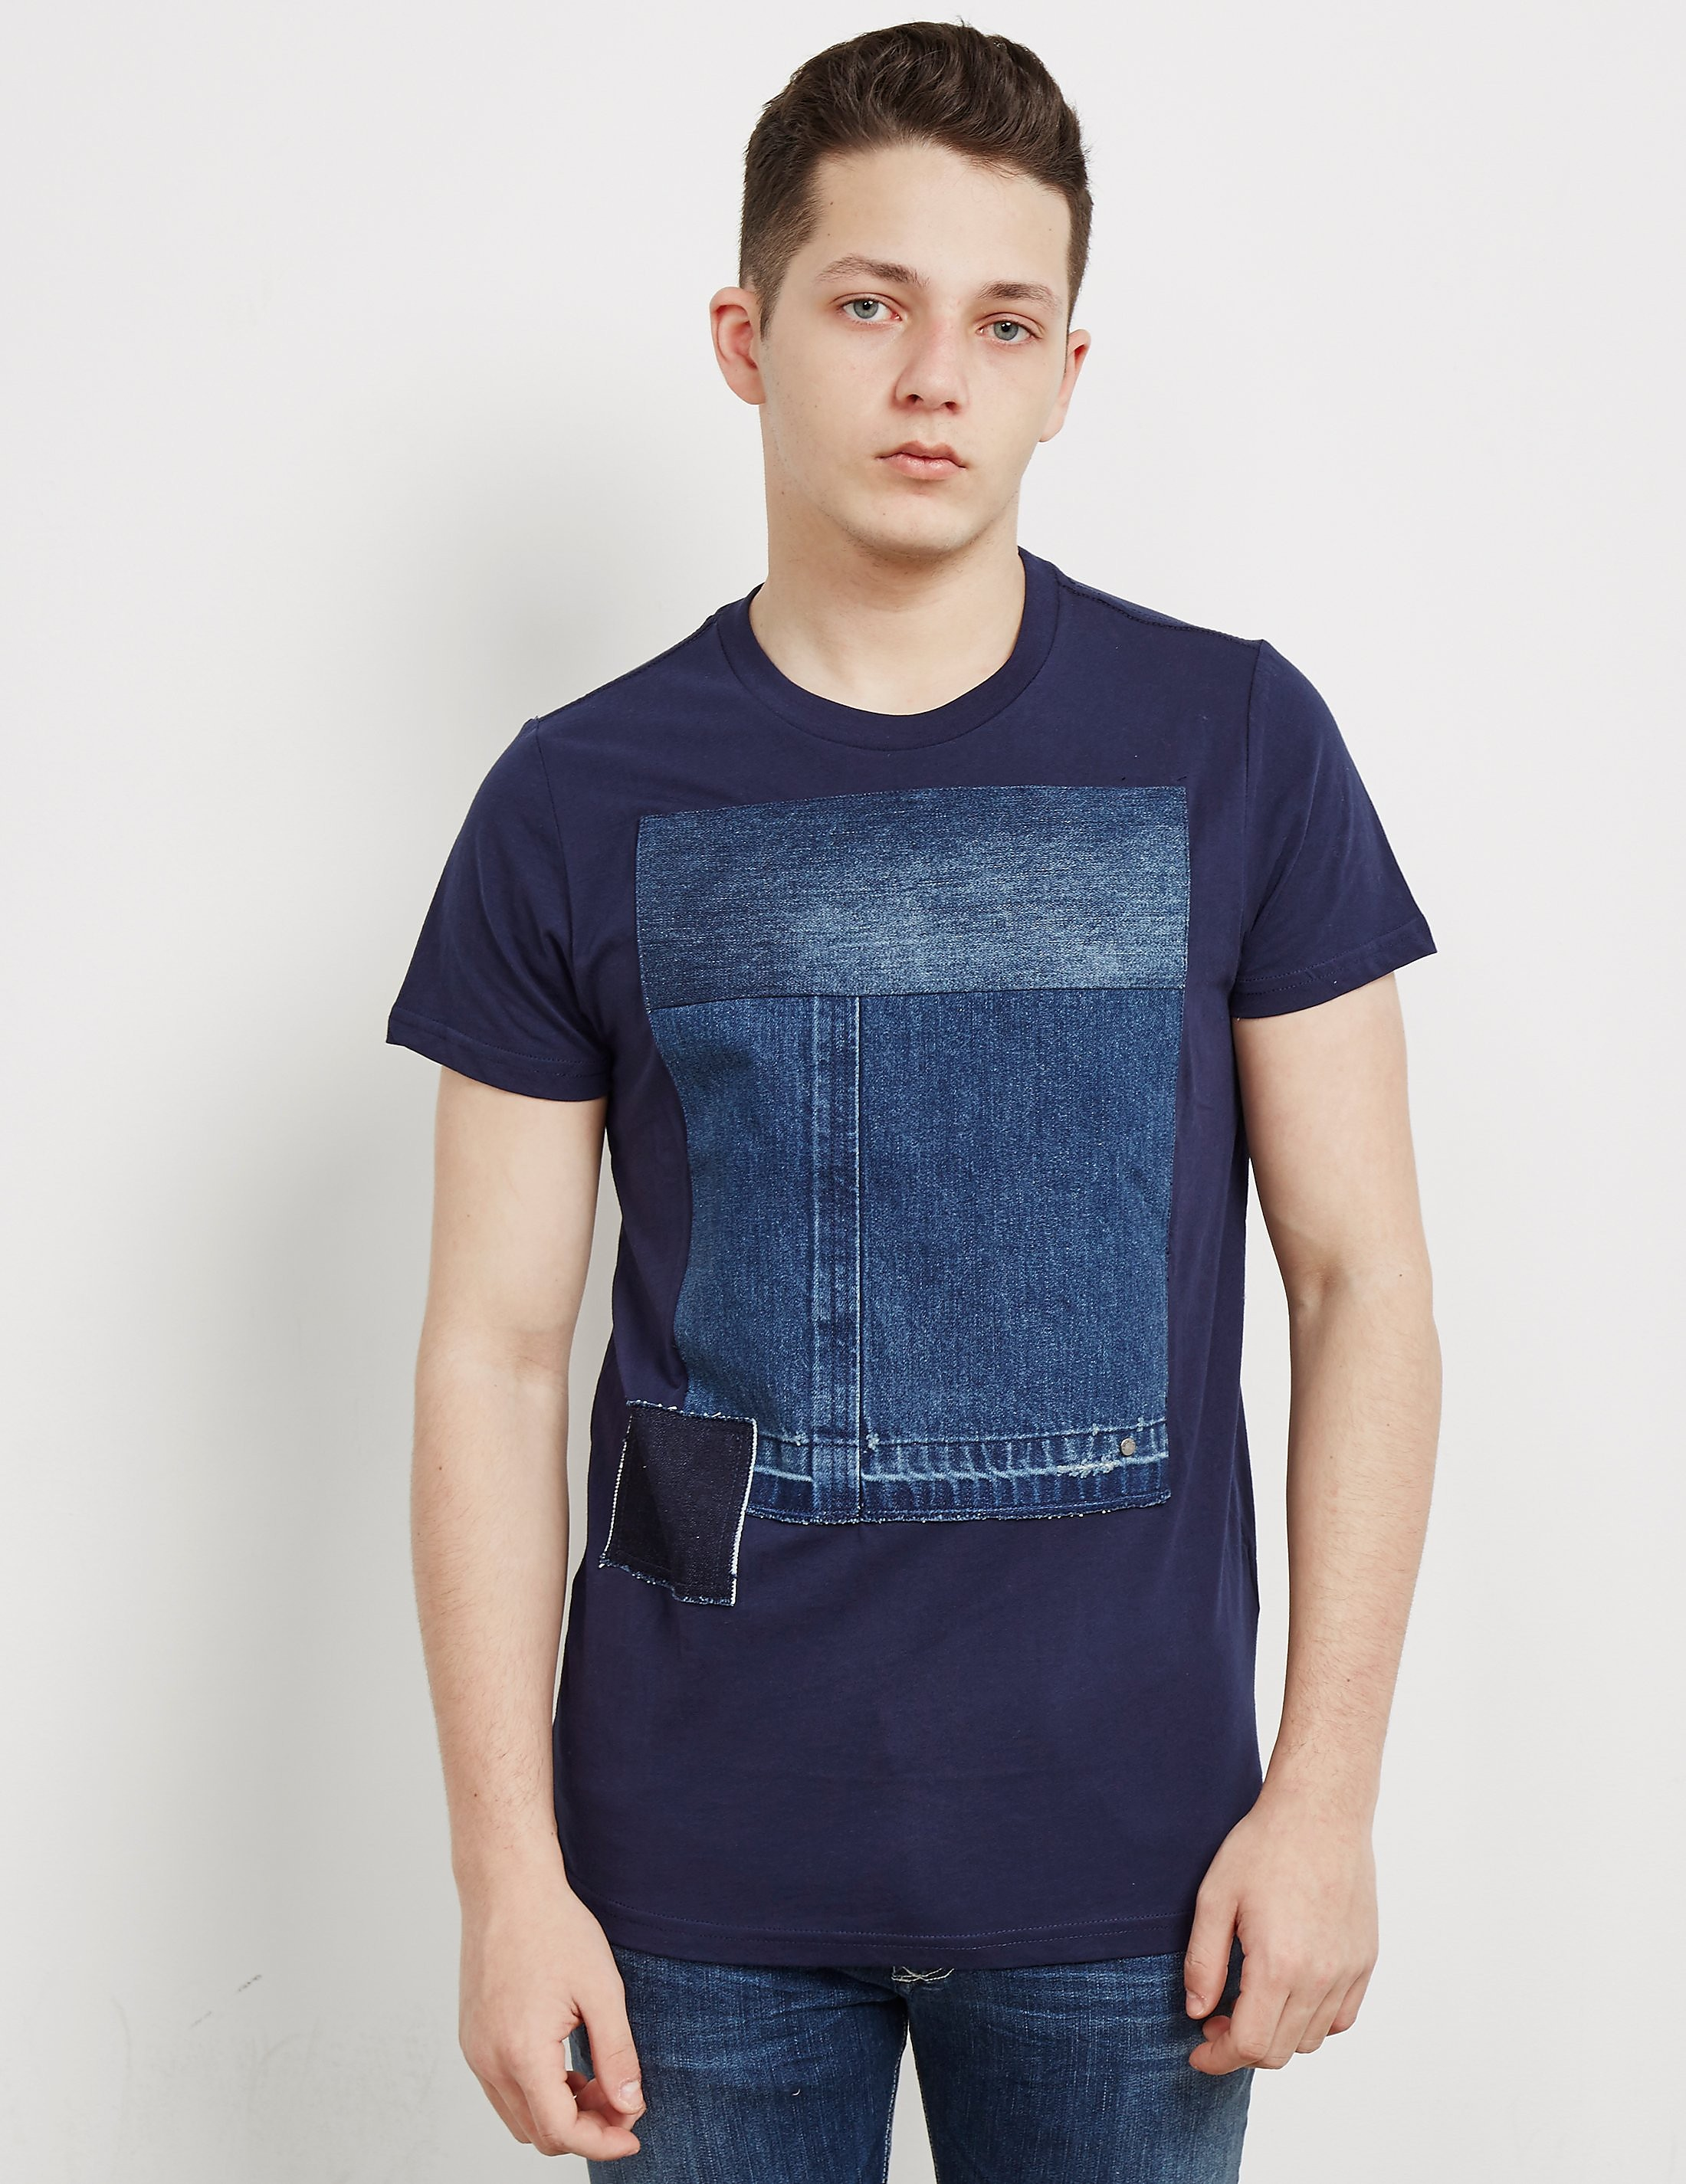 Diesel Patch Short Sleeve T-Shirt